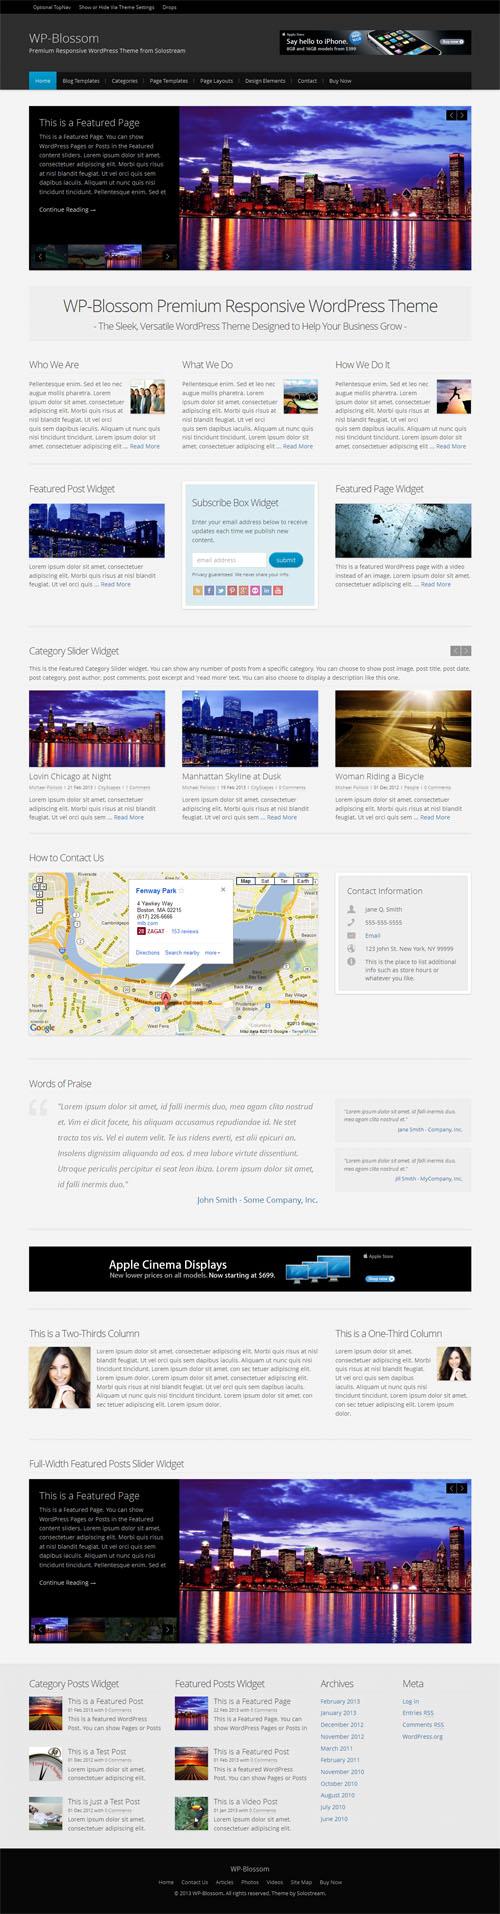 WP Blossom WordPress Theme